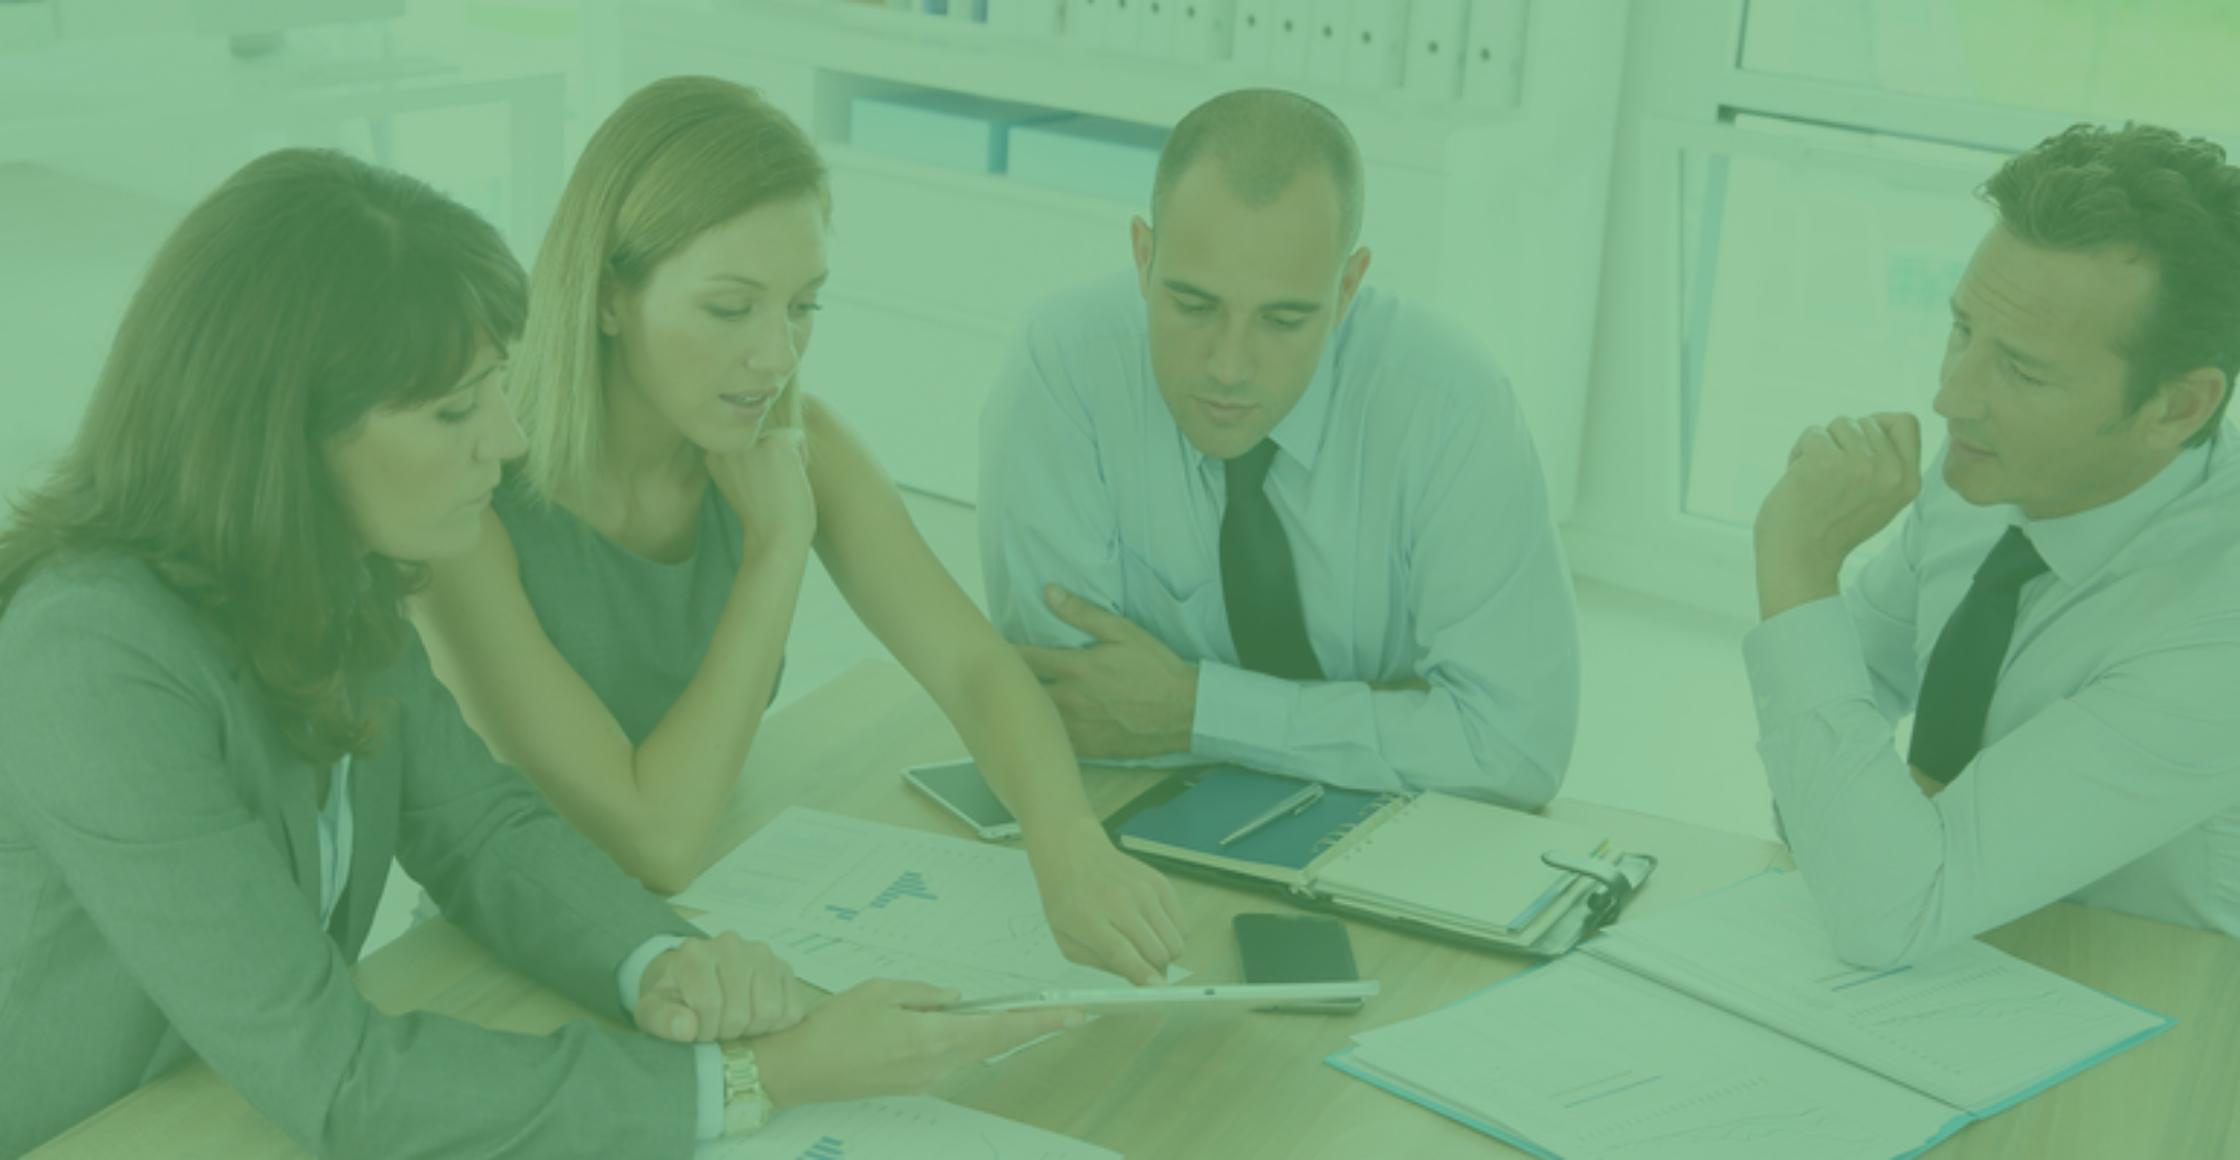 ILM Coaching Qualifications Explained